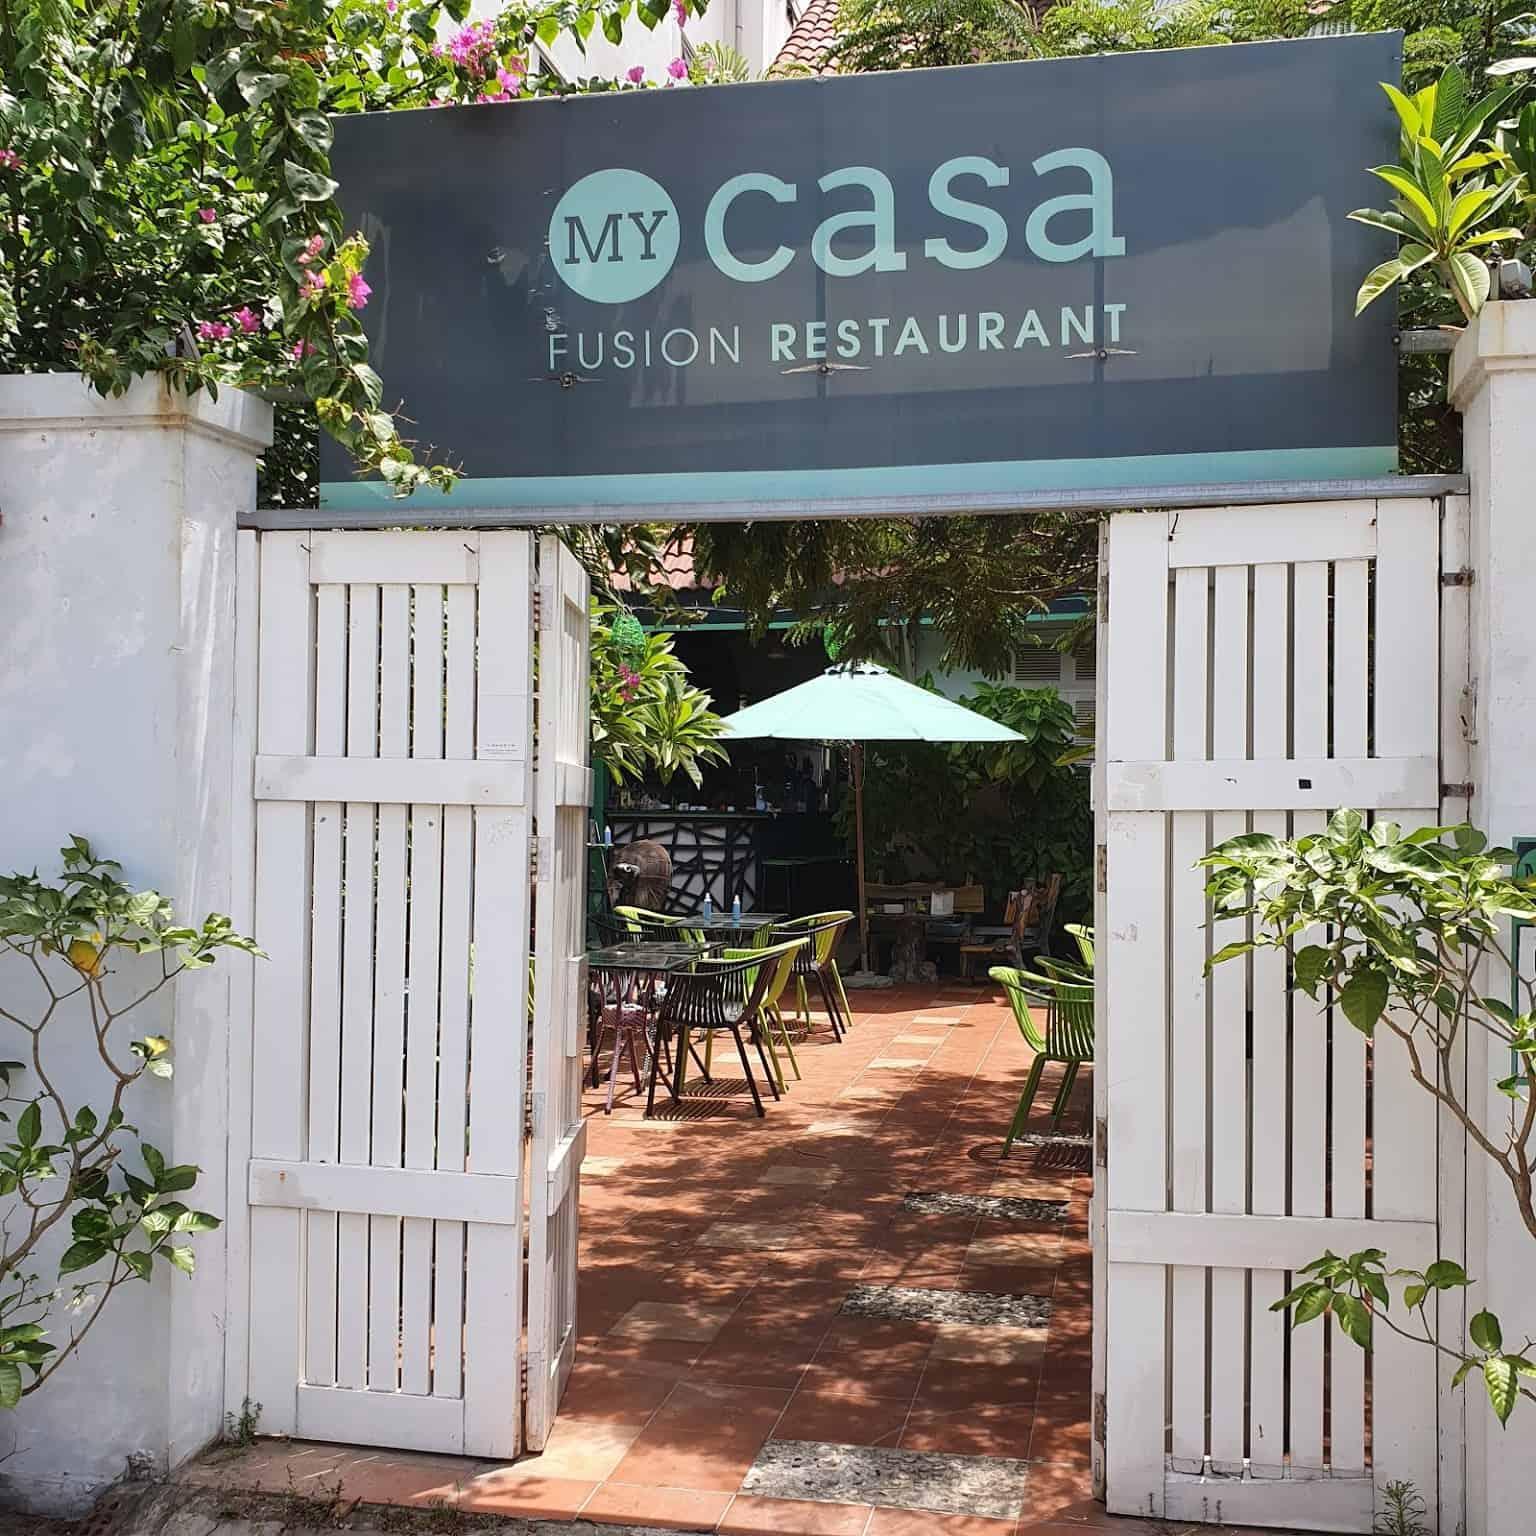 Outside My Casa restaurant in danang